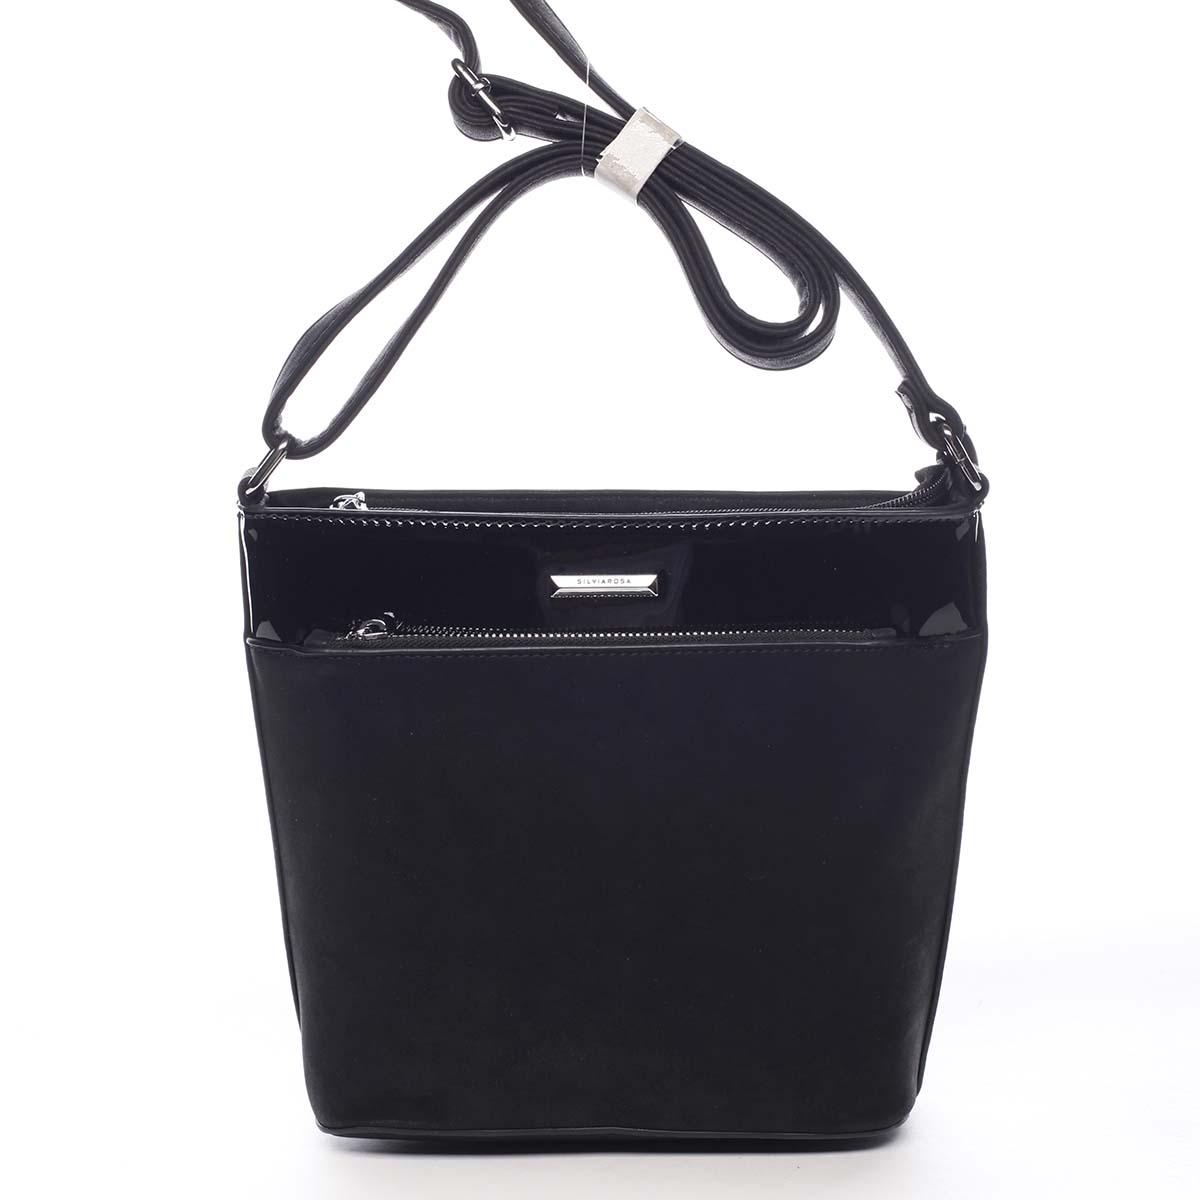 Dámská crossbody kabelka černá - Silvia Rosa Elizeth